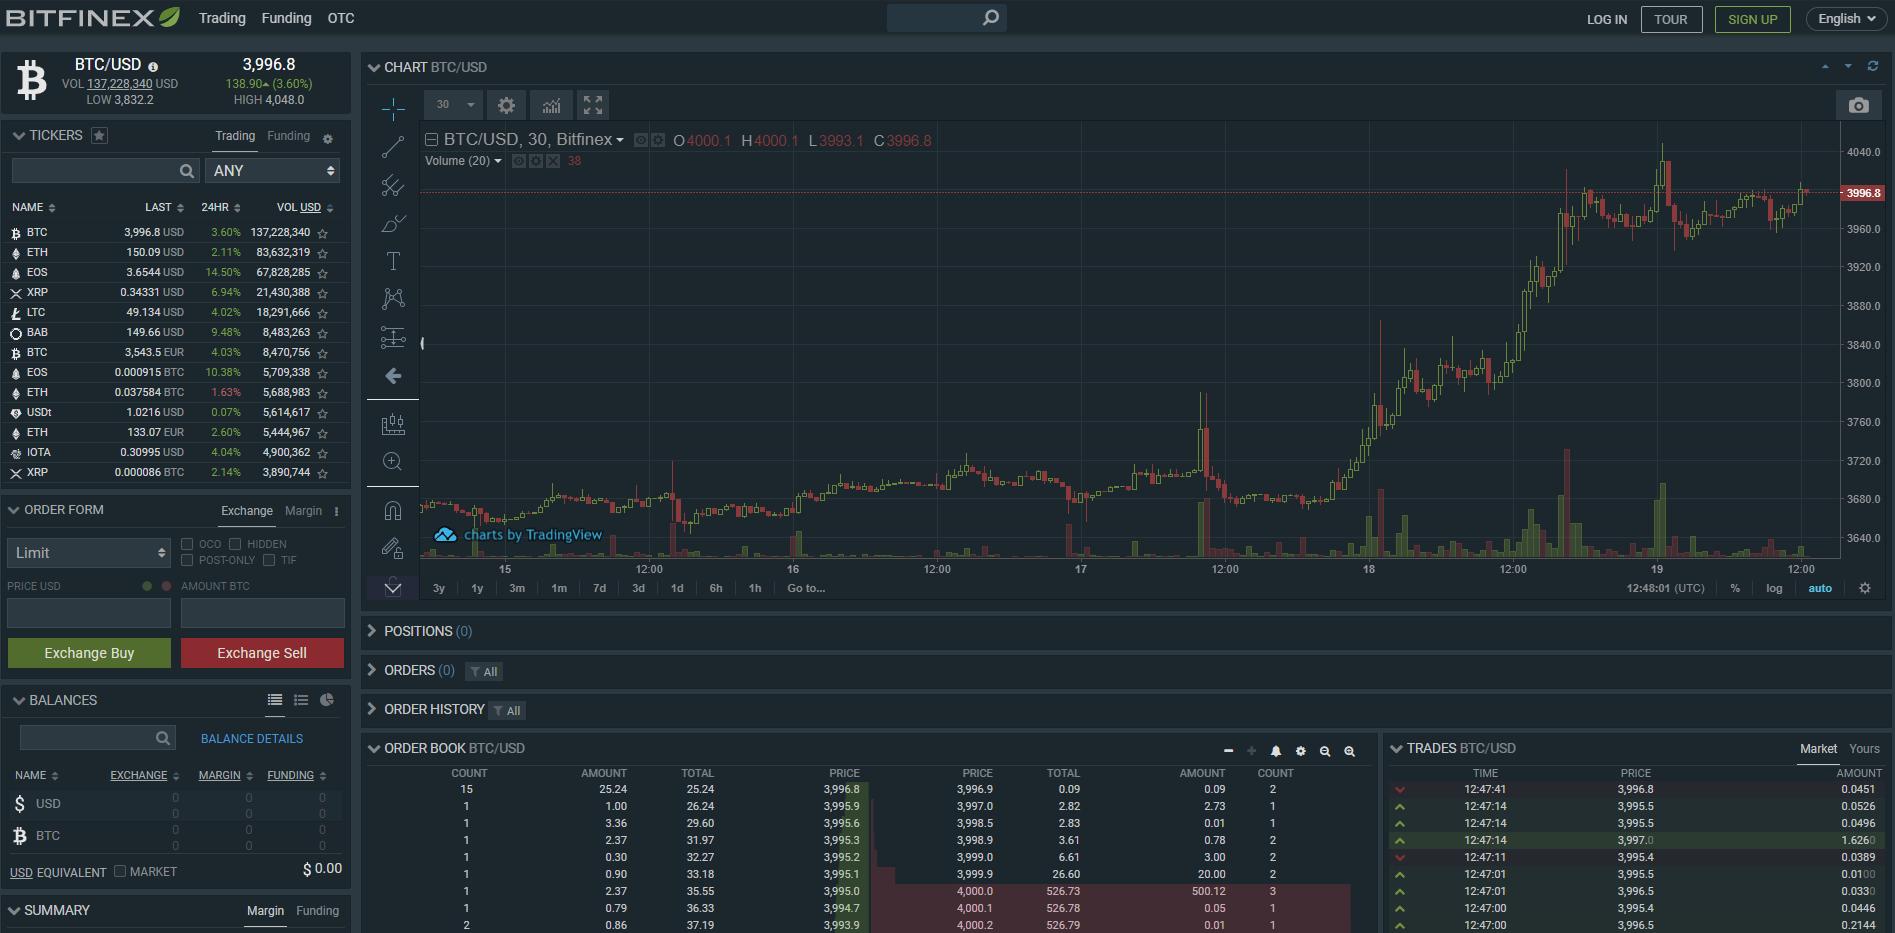 Bitfinex Trading View